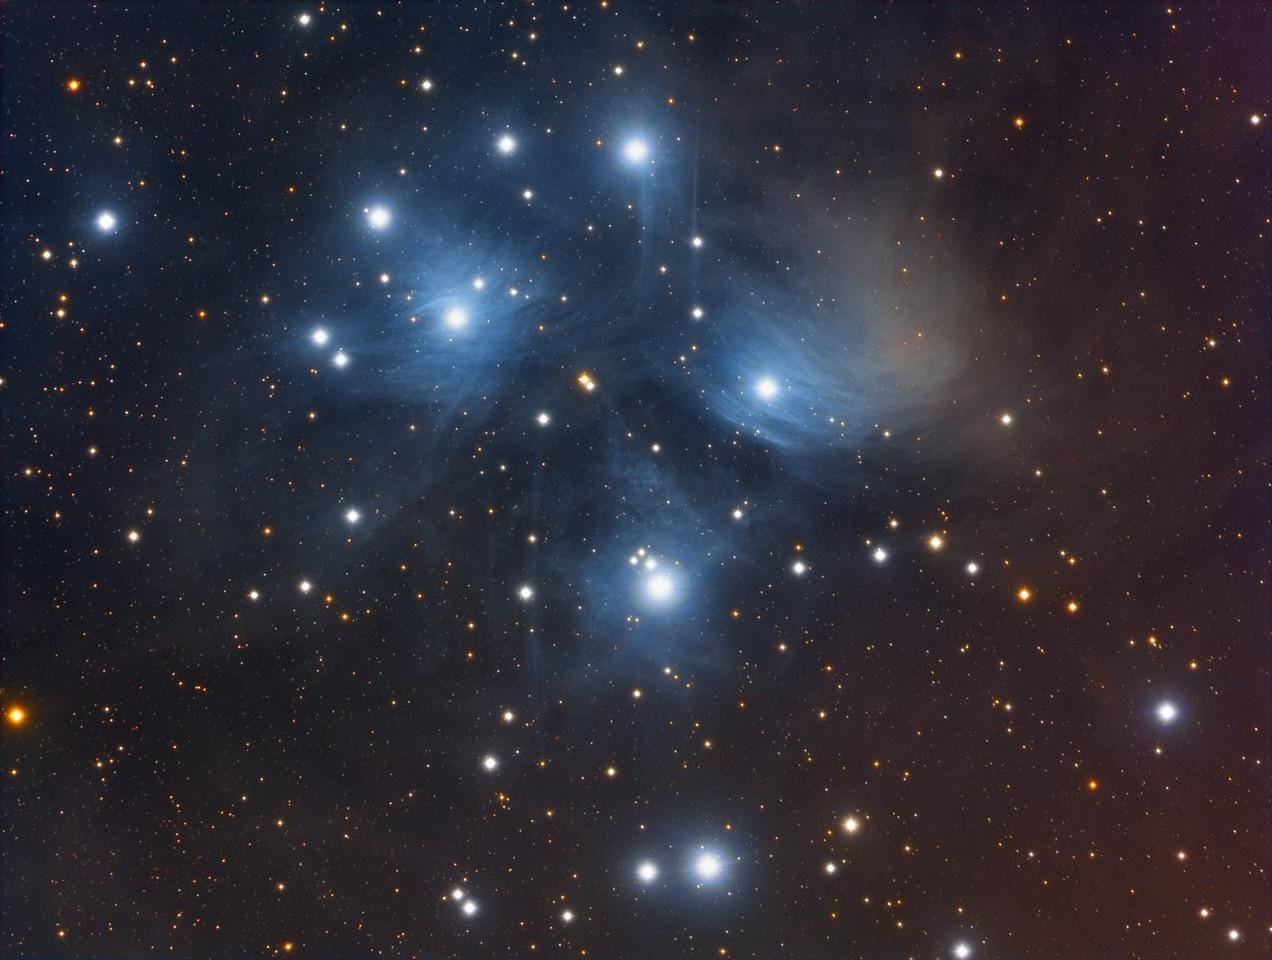 Pleiades Star Cluster  - M45